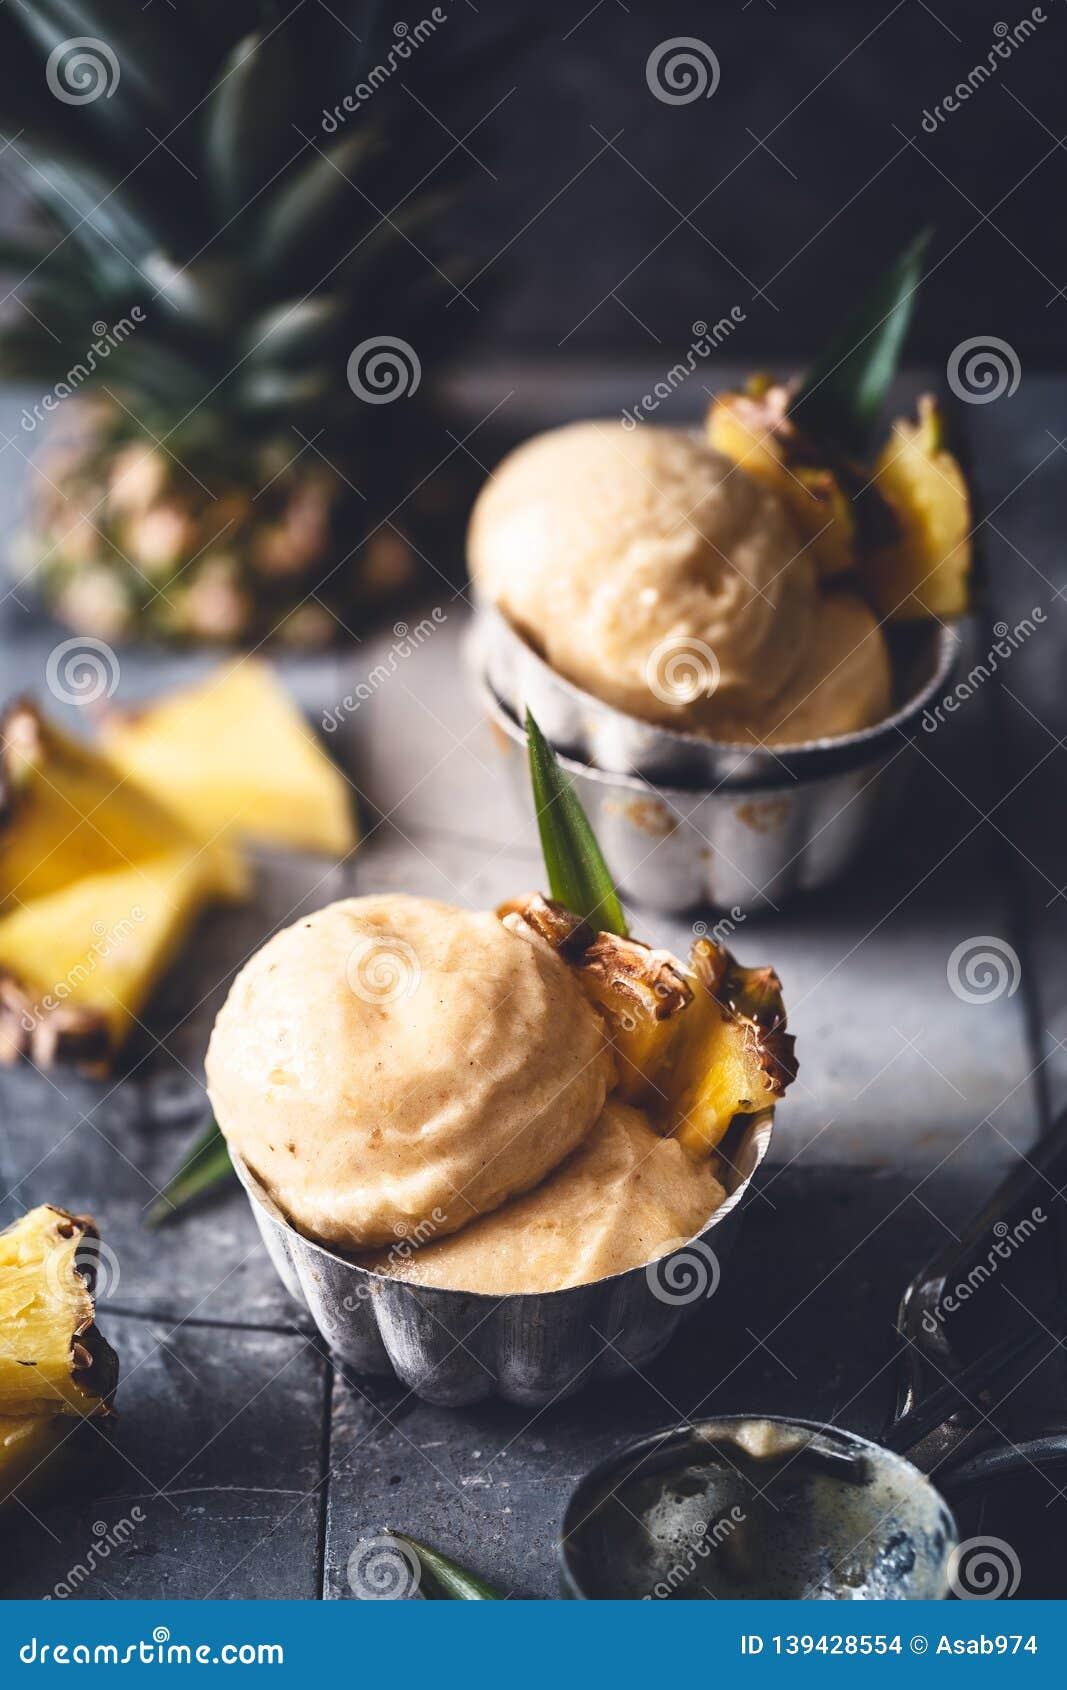 Pineapple Ice Cream for Summer